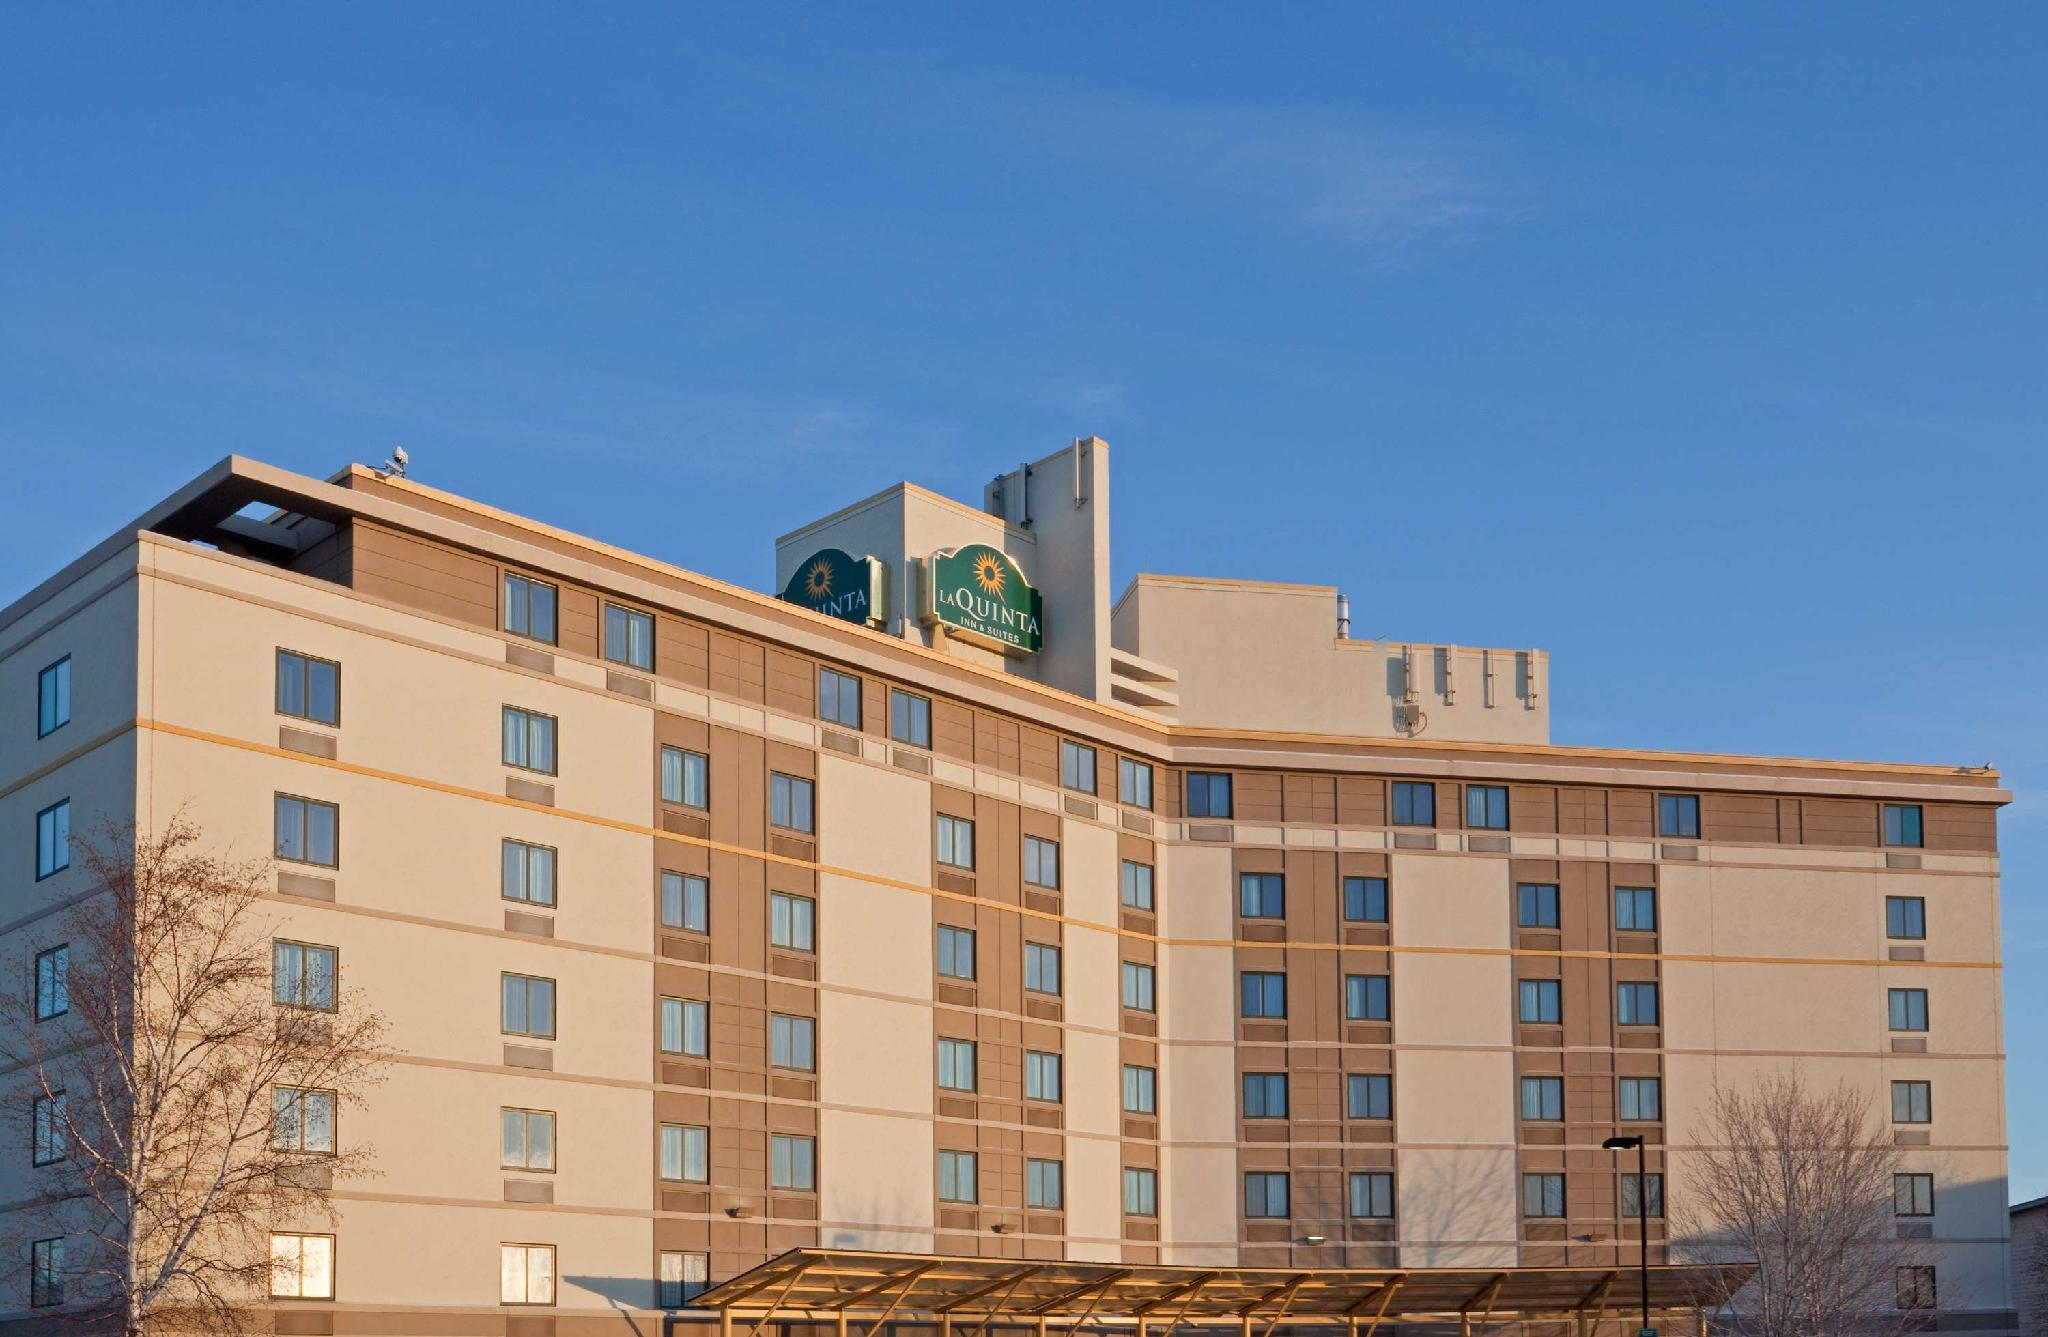 La Quinta Inn And Suites By Wyndham Boston Somerville